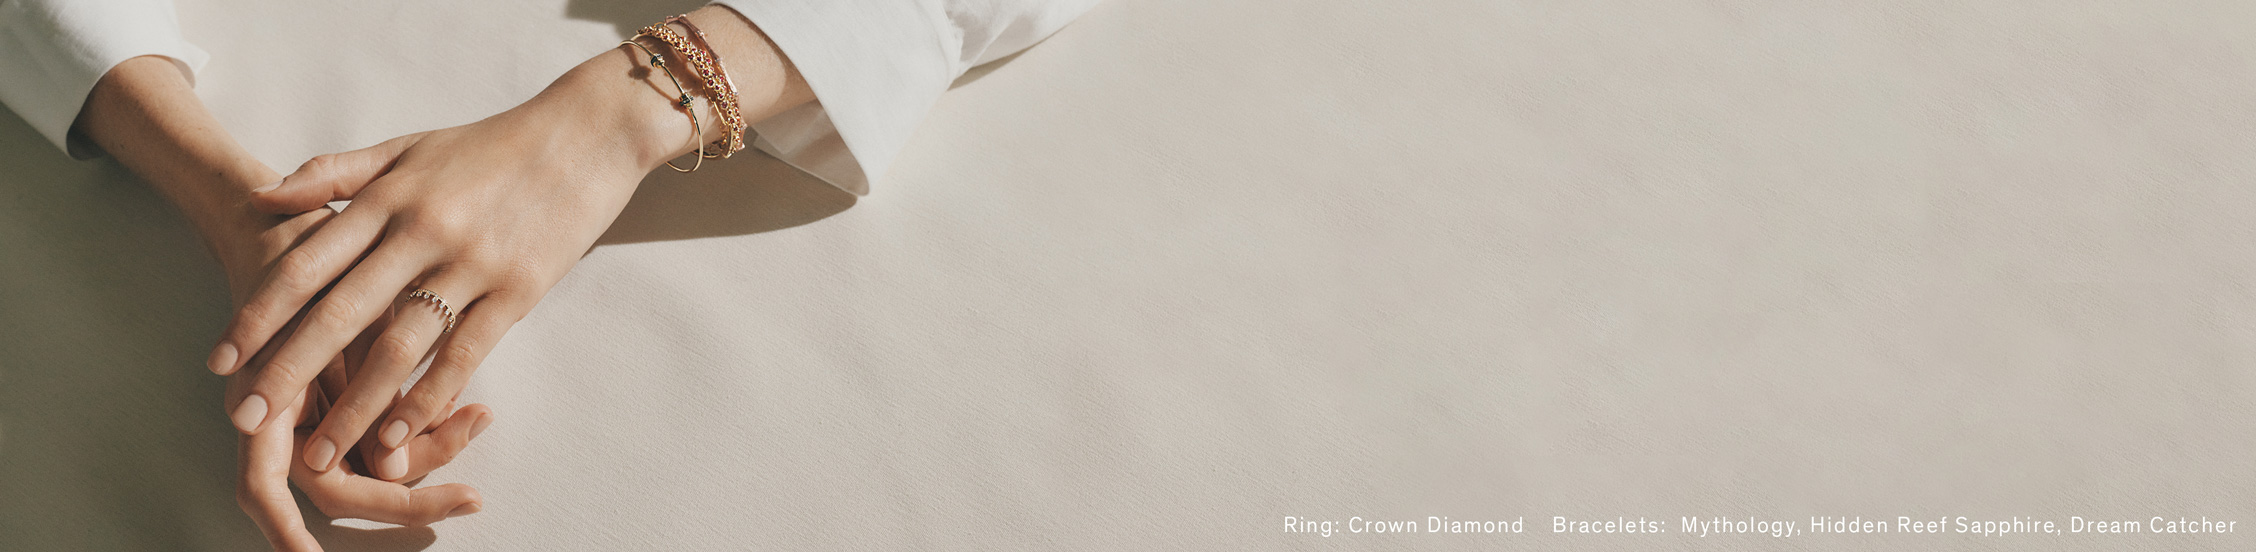 Annoushka Bangles & Bracelets